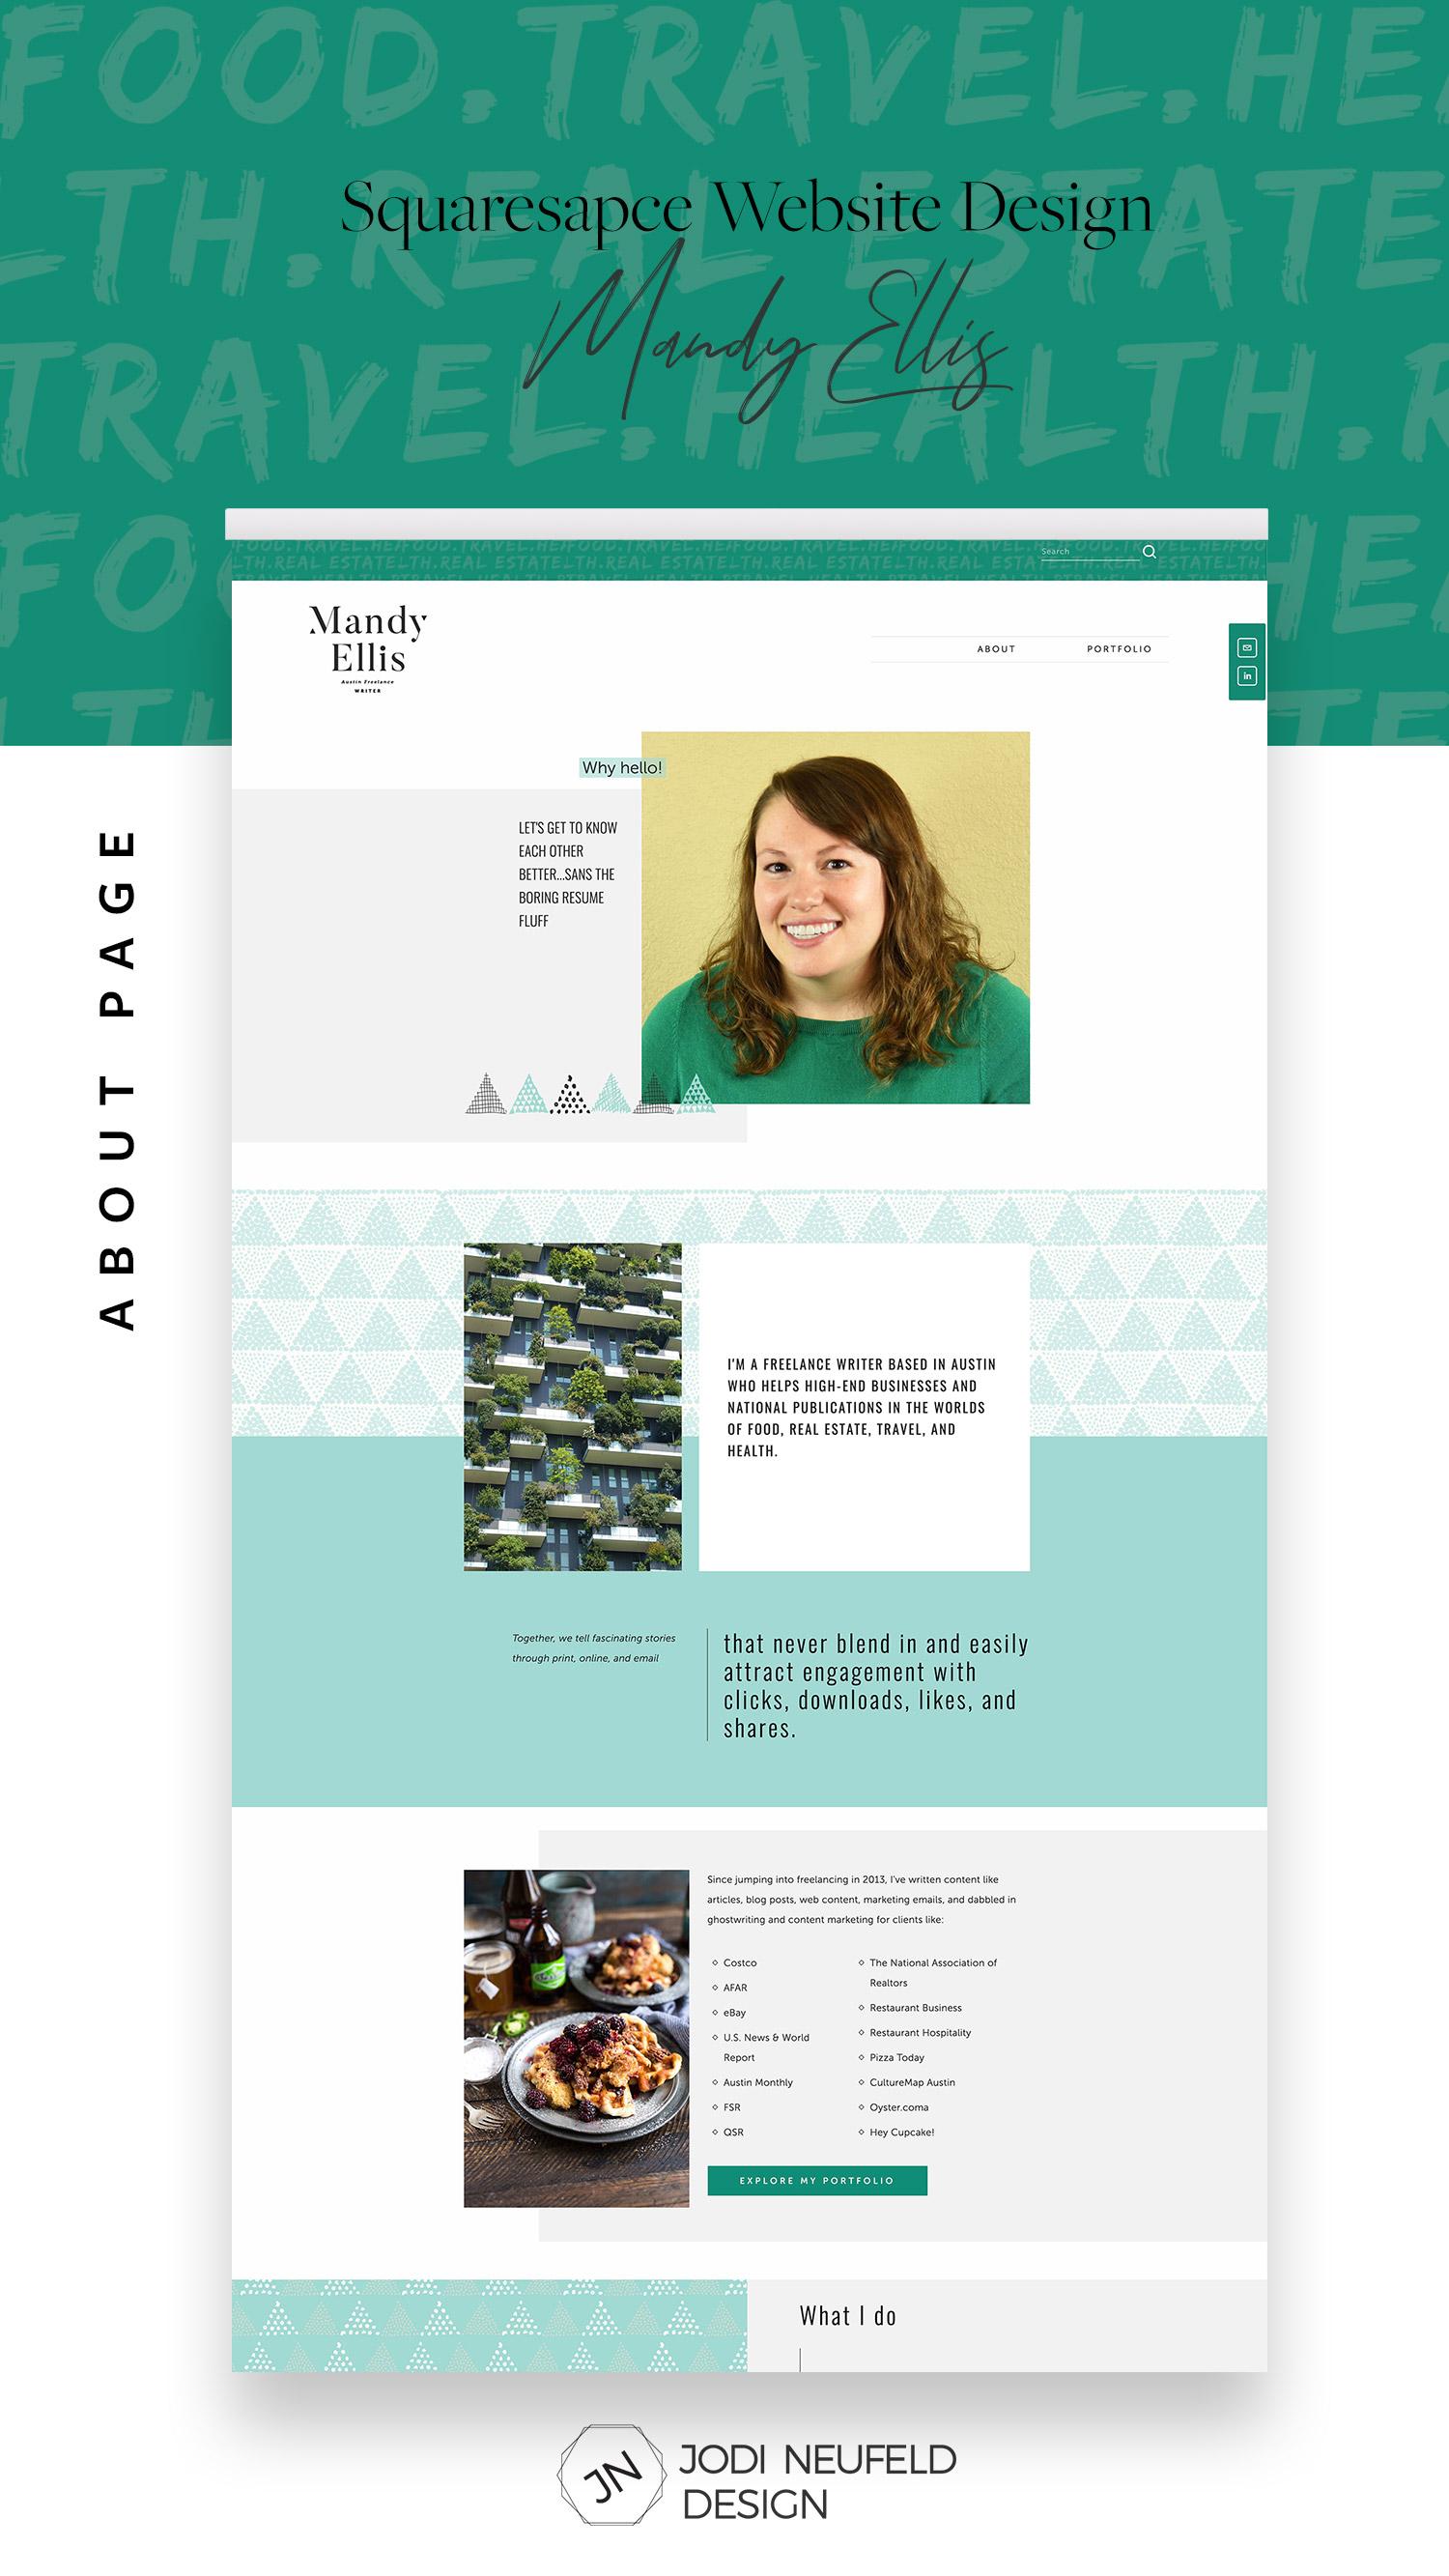 Mandy Ellis About page | #writerwebsite | #squarespace #webdesign by Jodi Neufeld Design